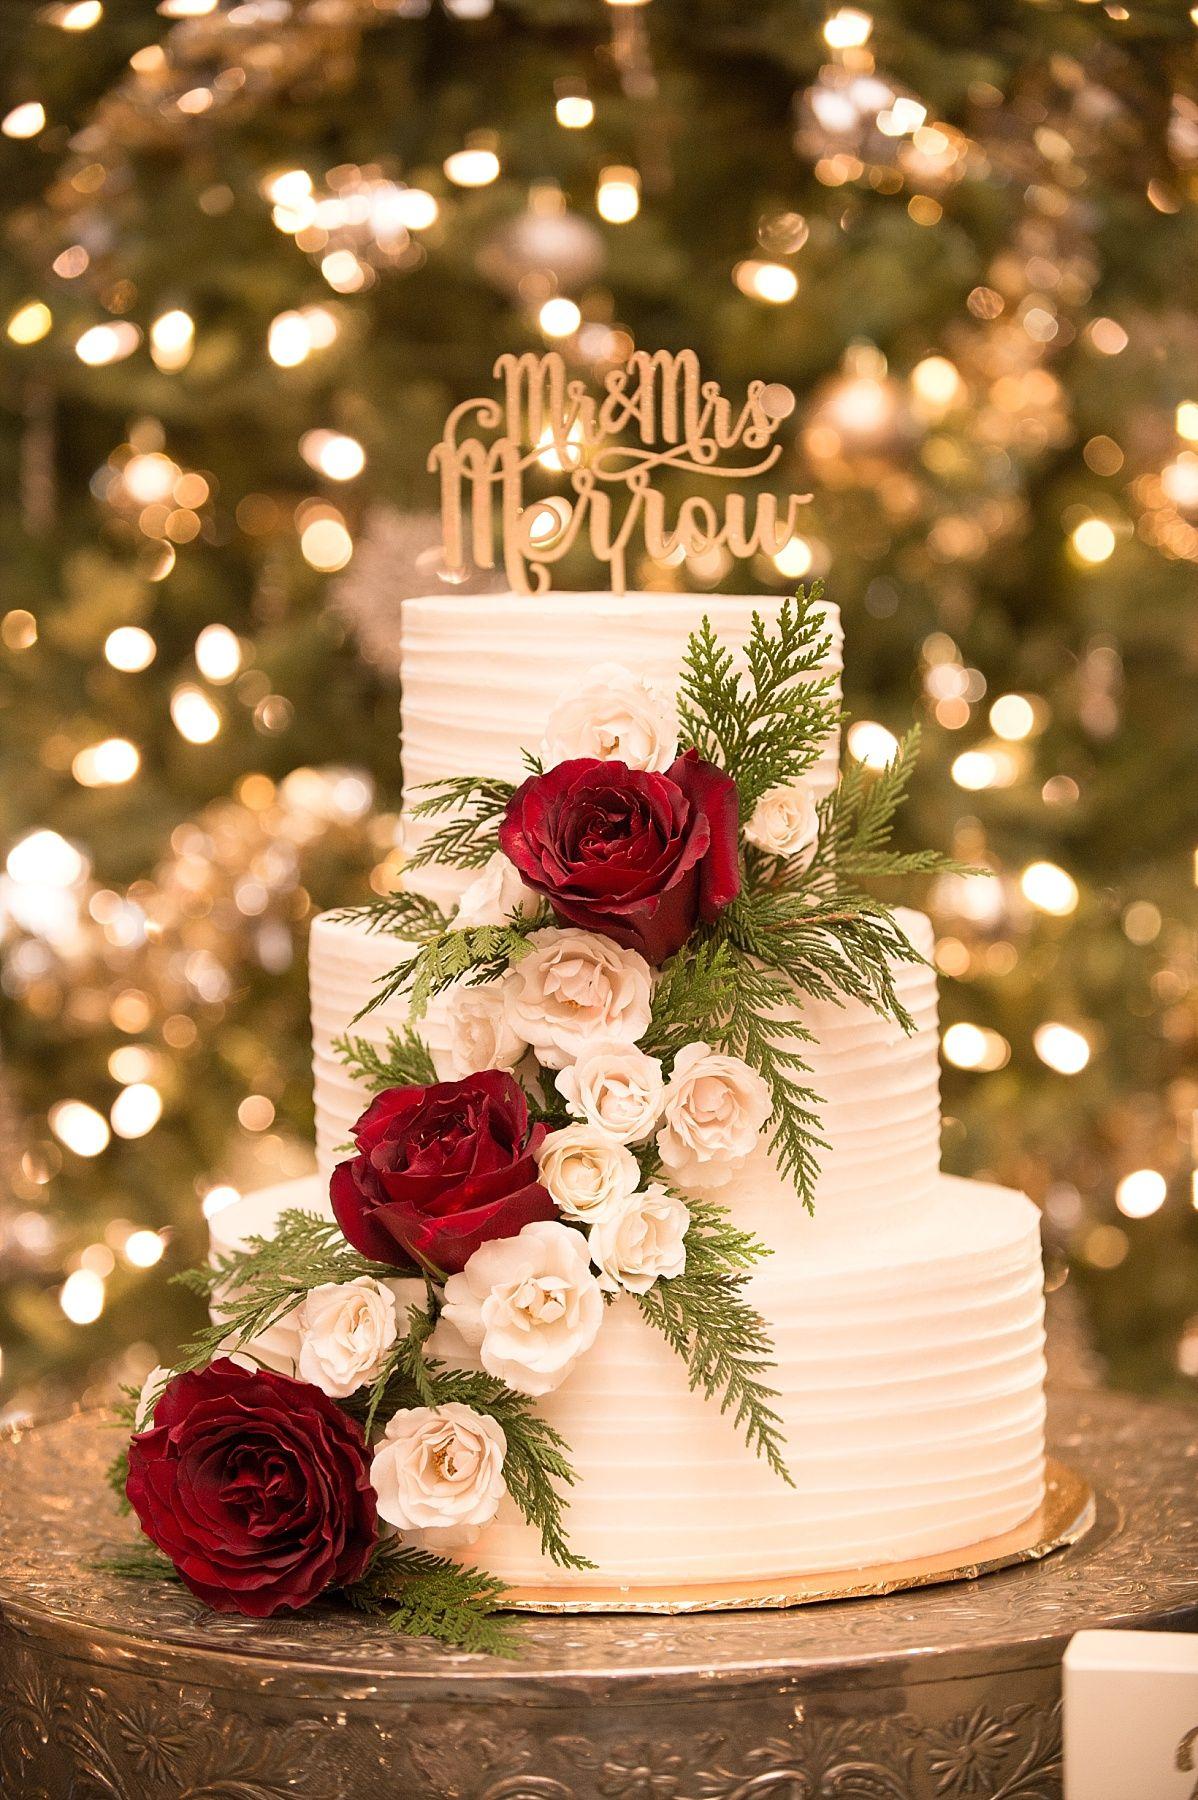 Three Tier White Wedding Cake With Flowers